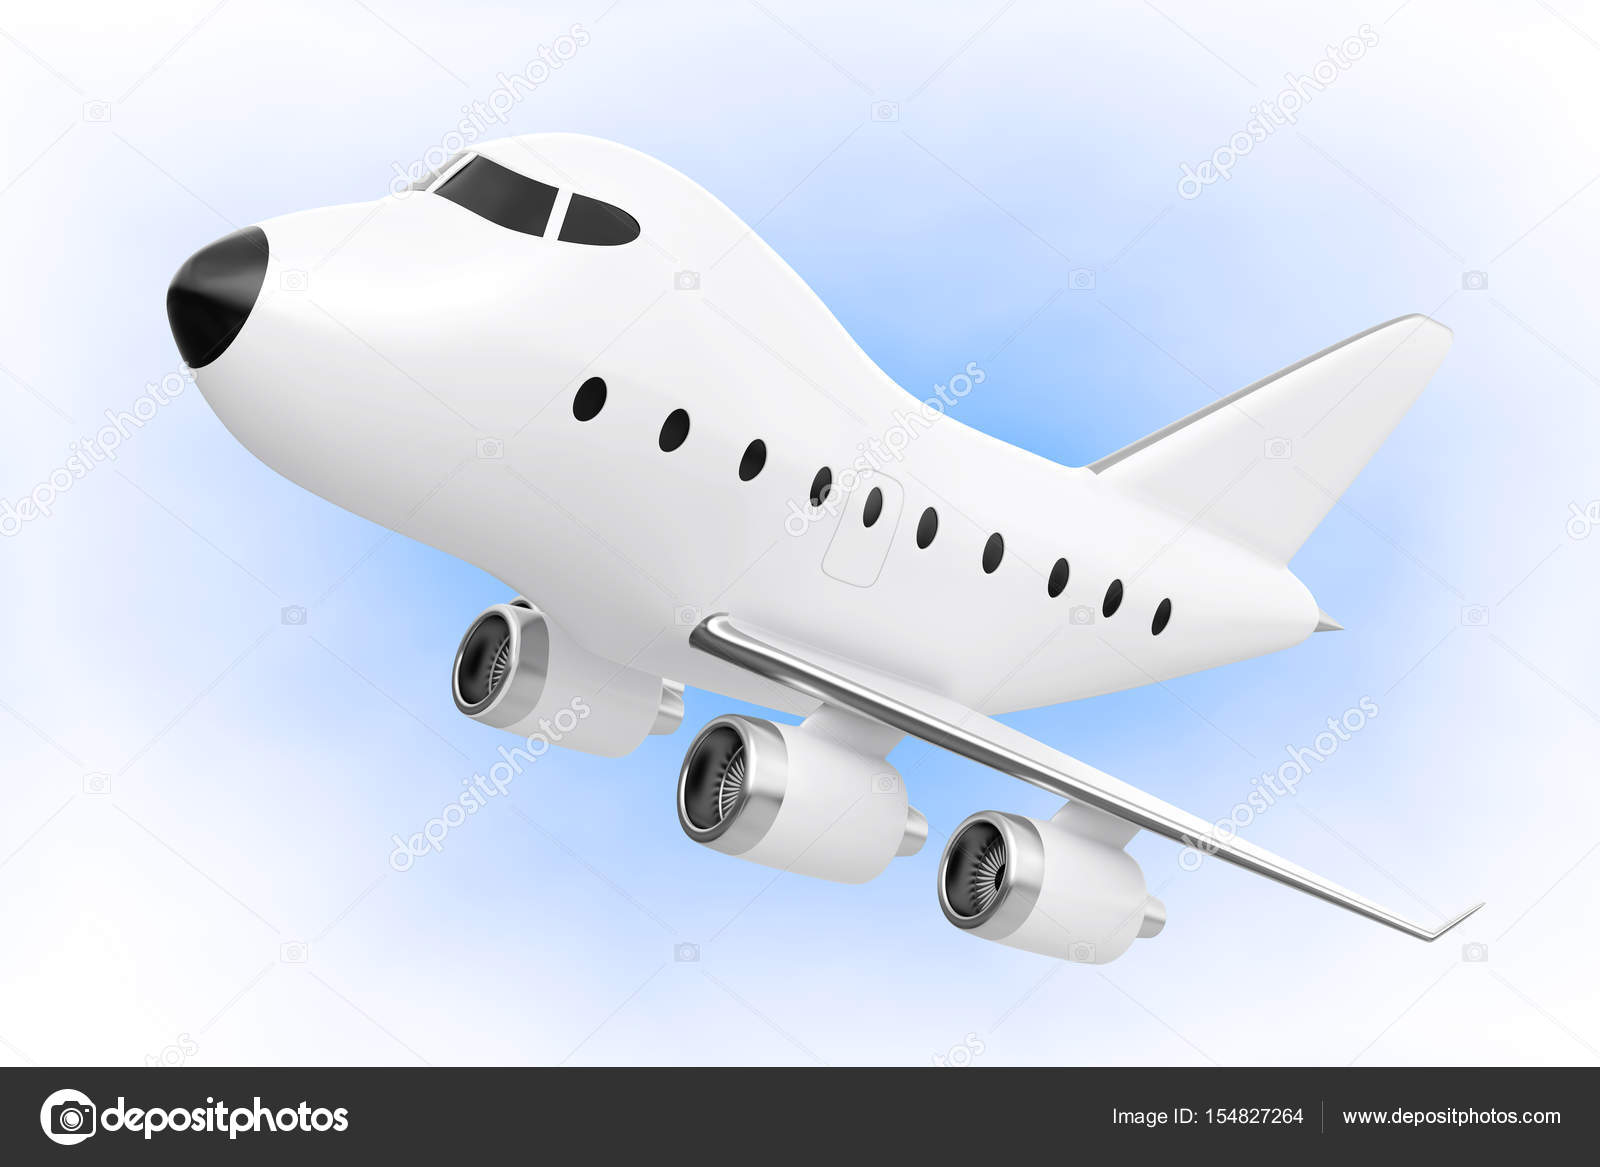 Fotografie: jet aereo cartoni dei cartoni animati giocattolo